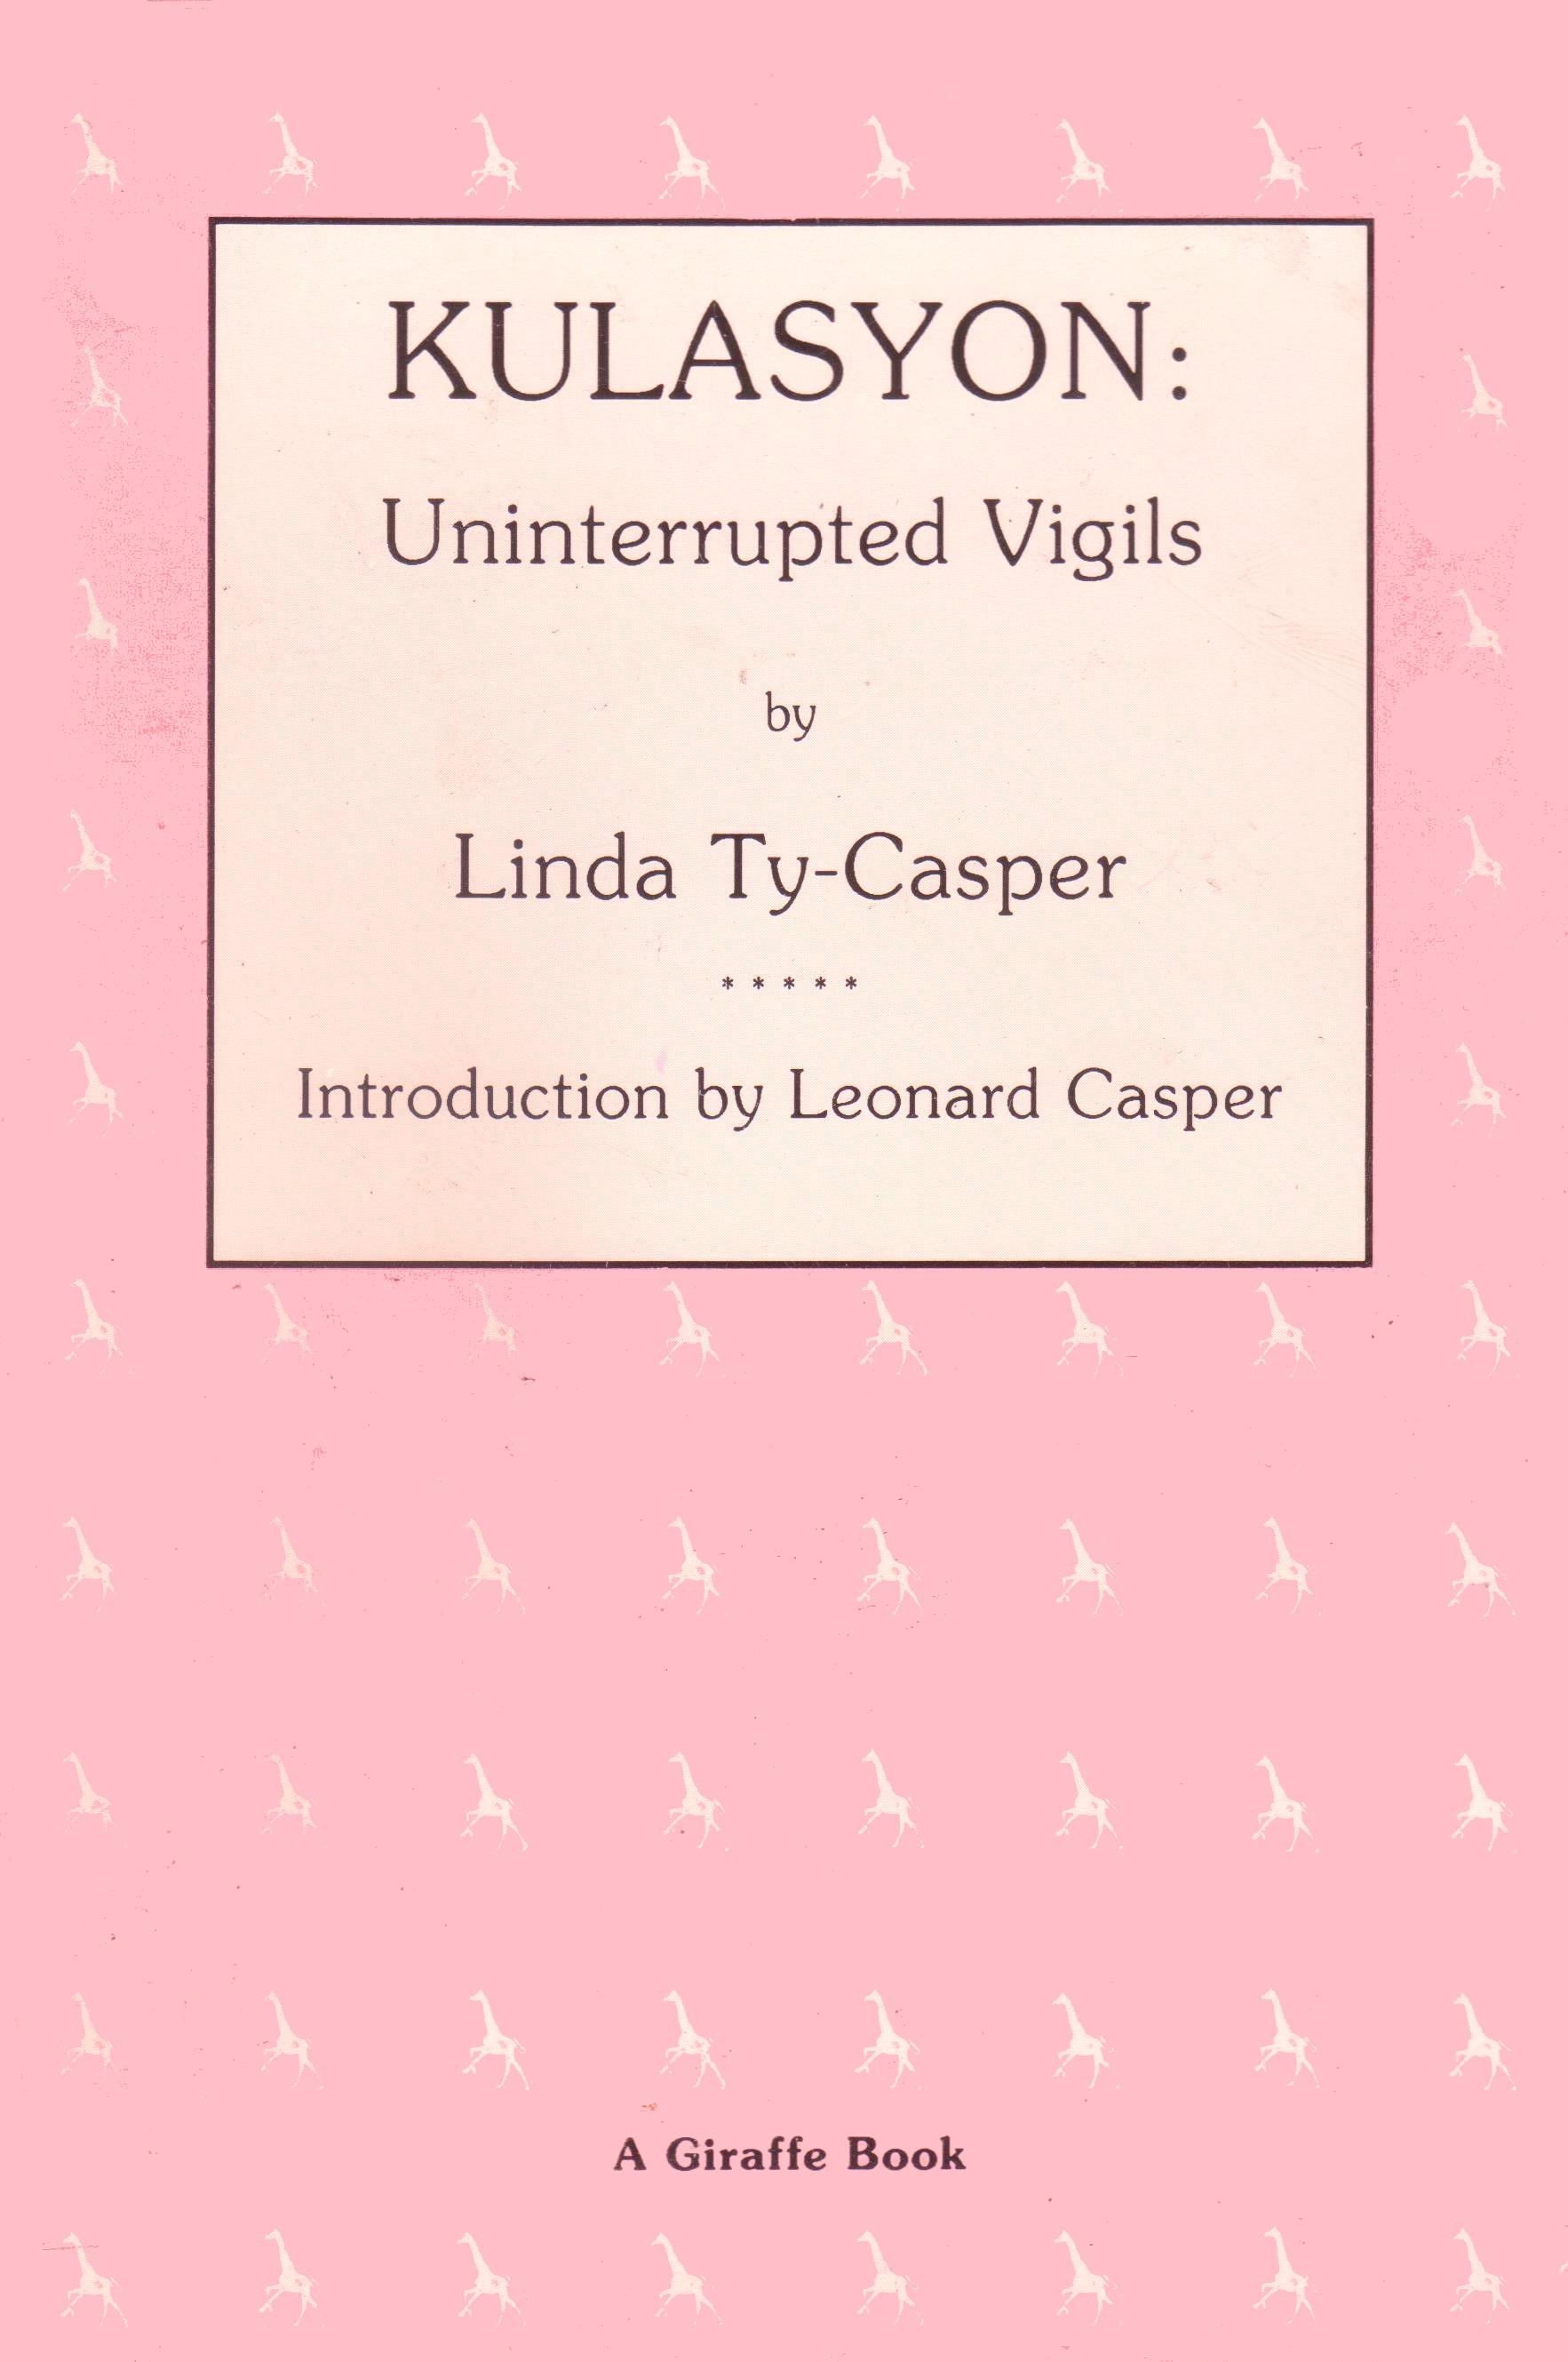 Kulasyon: Uninterrupted Vigils